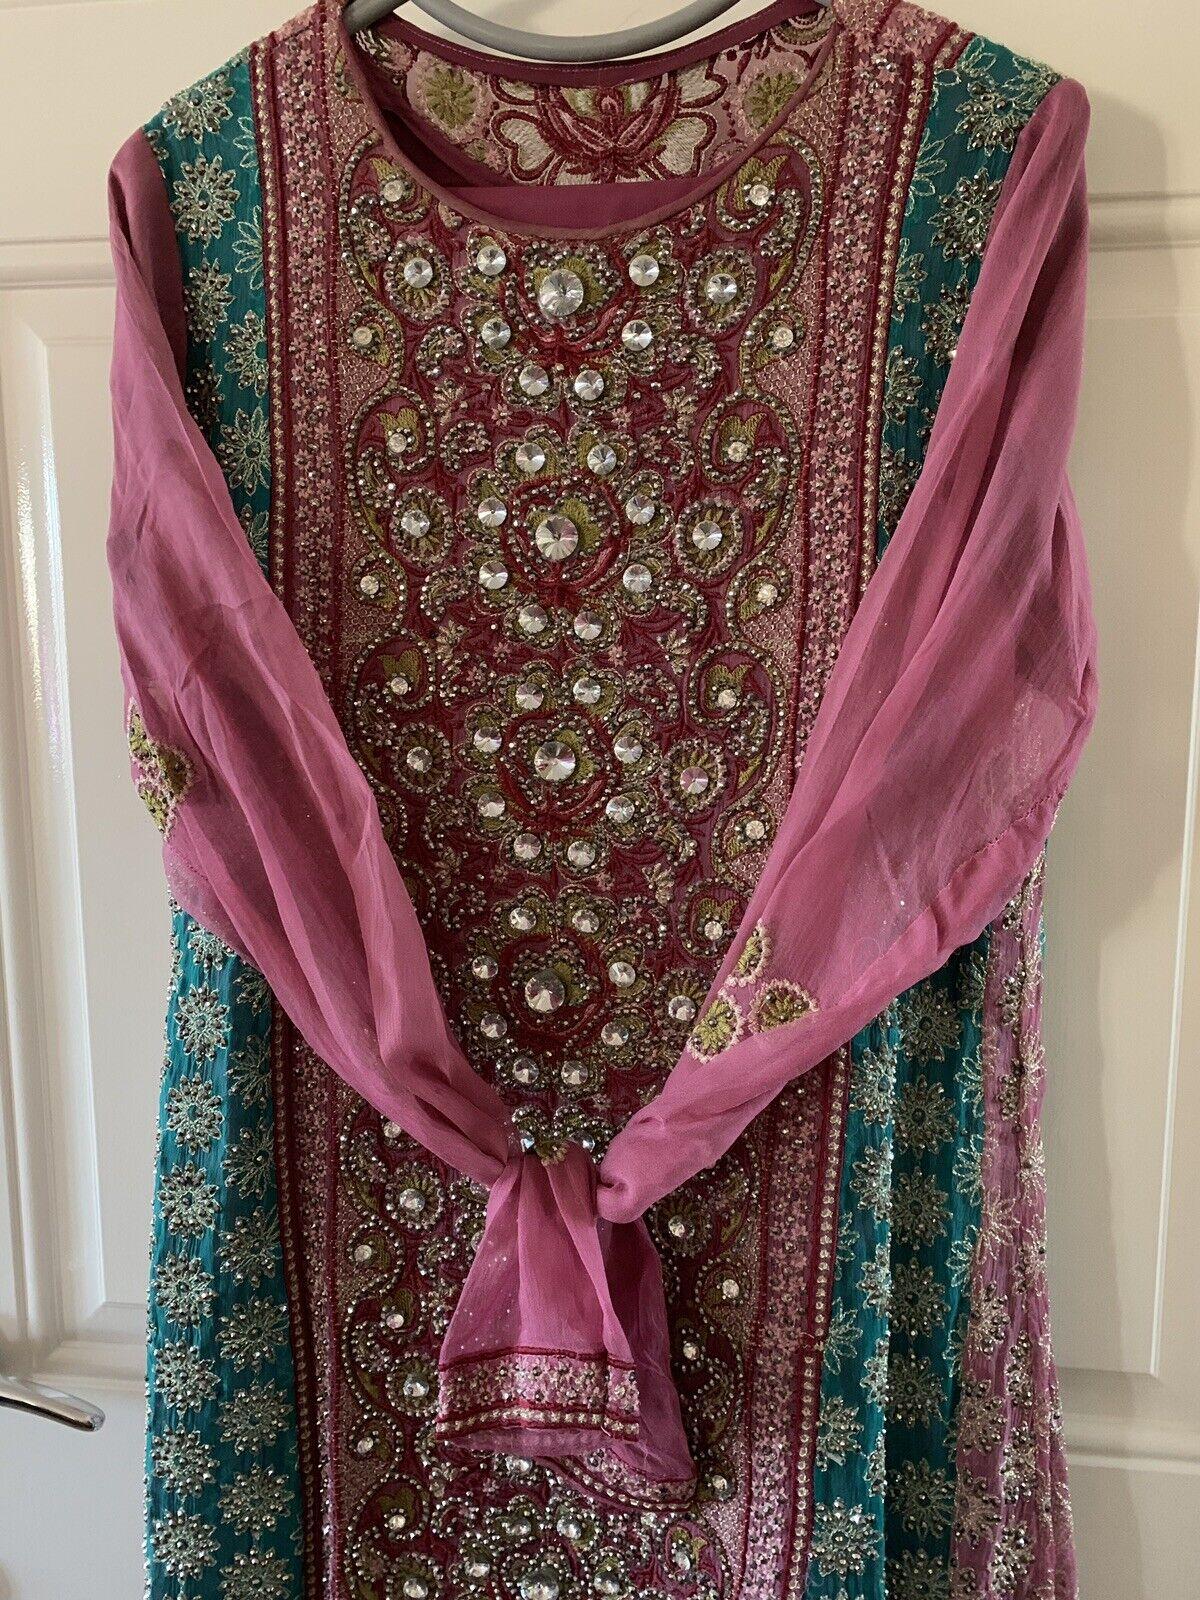 Ladies Asian Stunning 3 Piece Piece Piece Long Maxi Dress Style Size Dress 14 431551